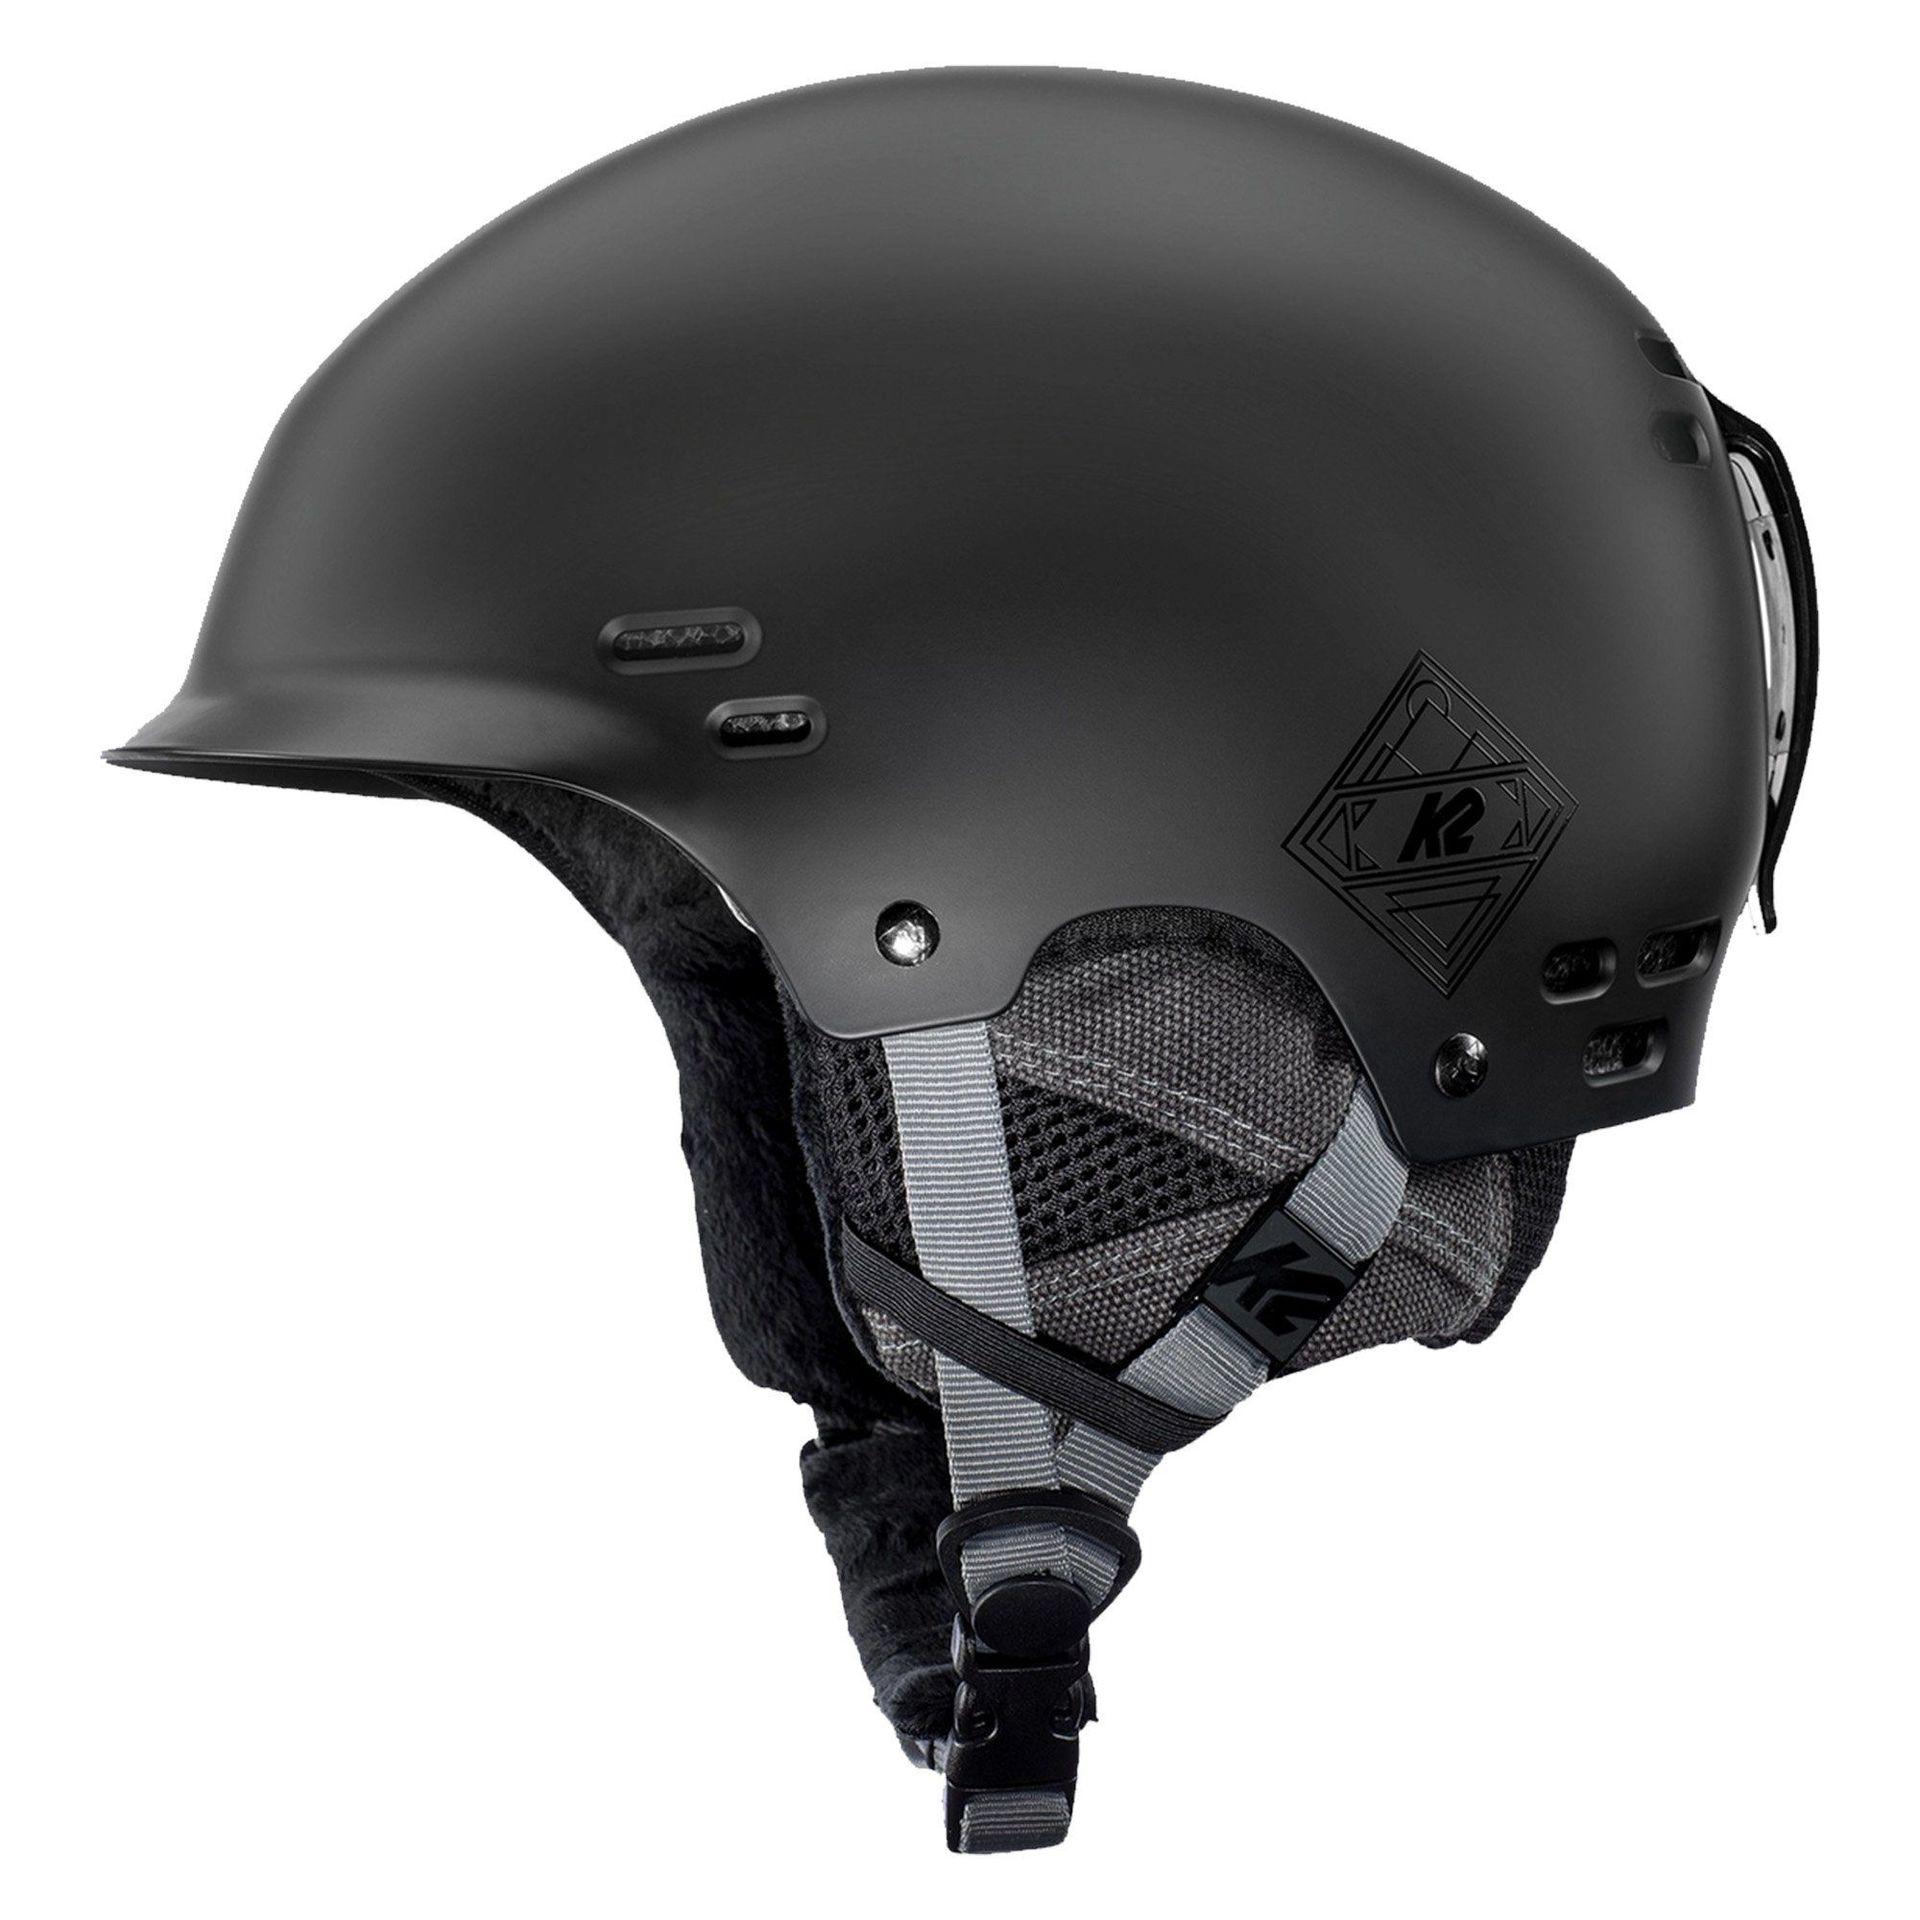 KASK K2 THRIVE 10C4004-31 BLACK